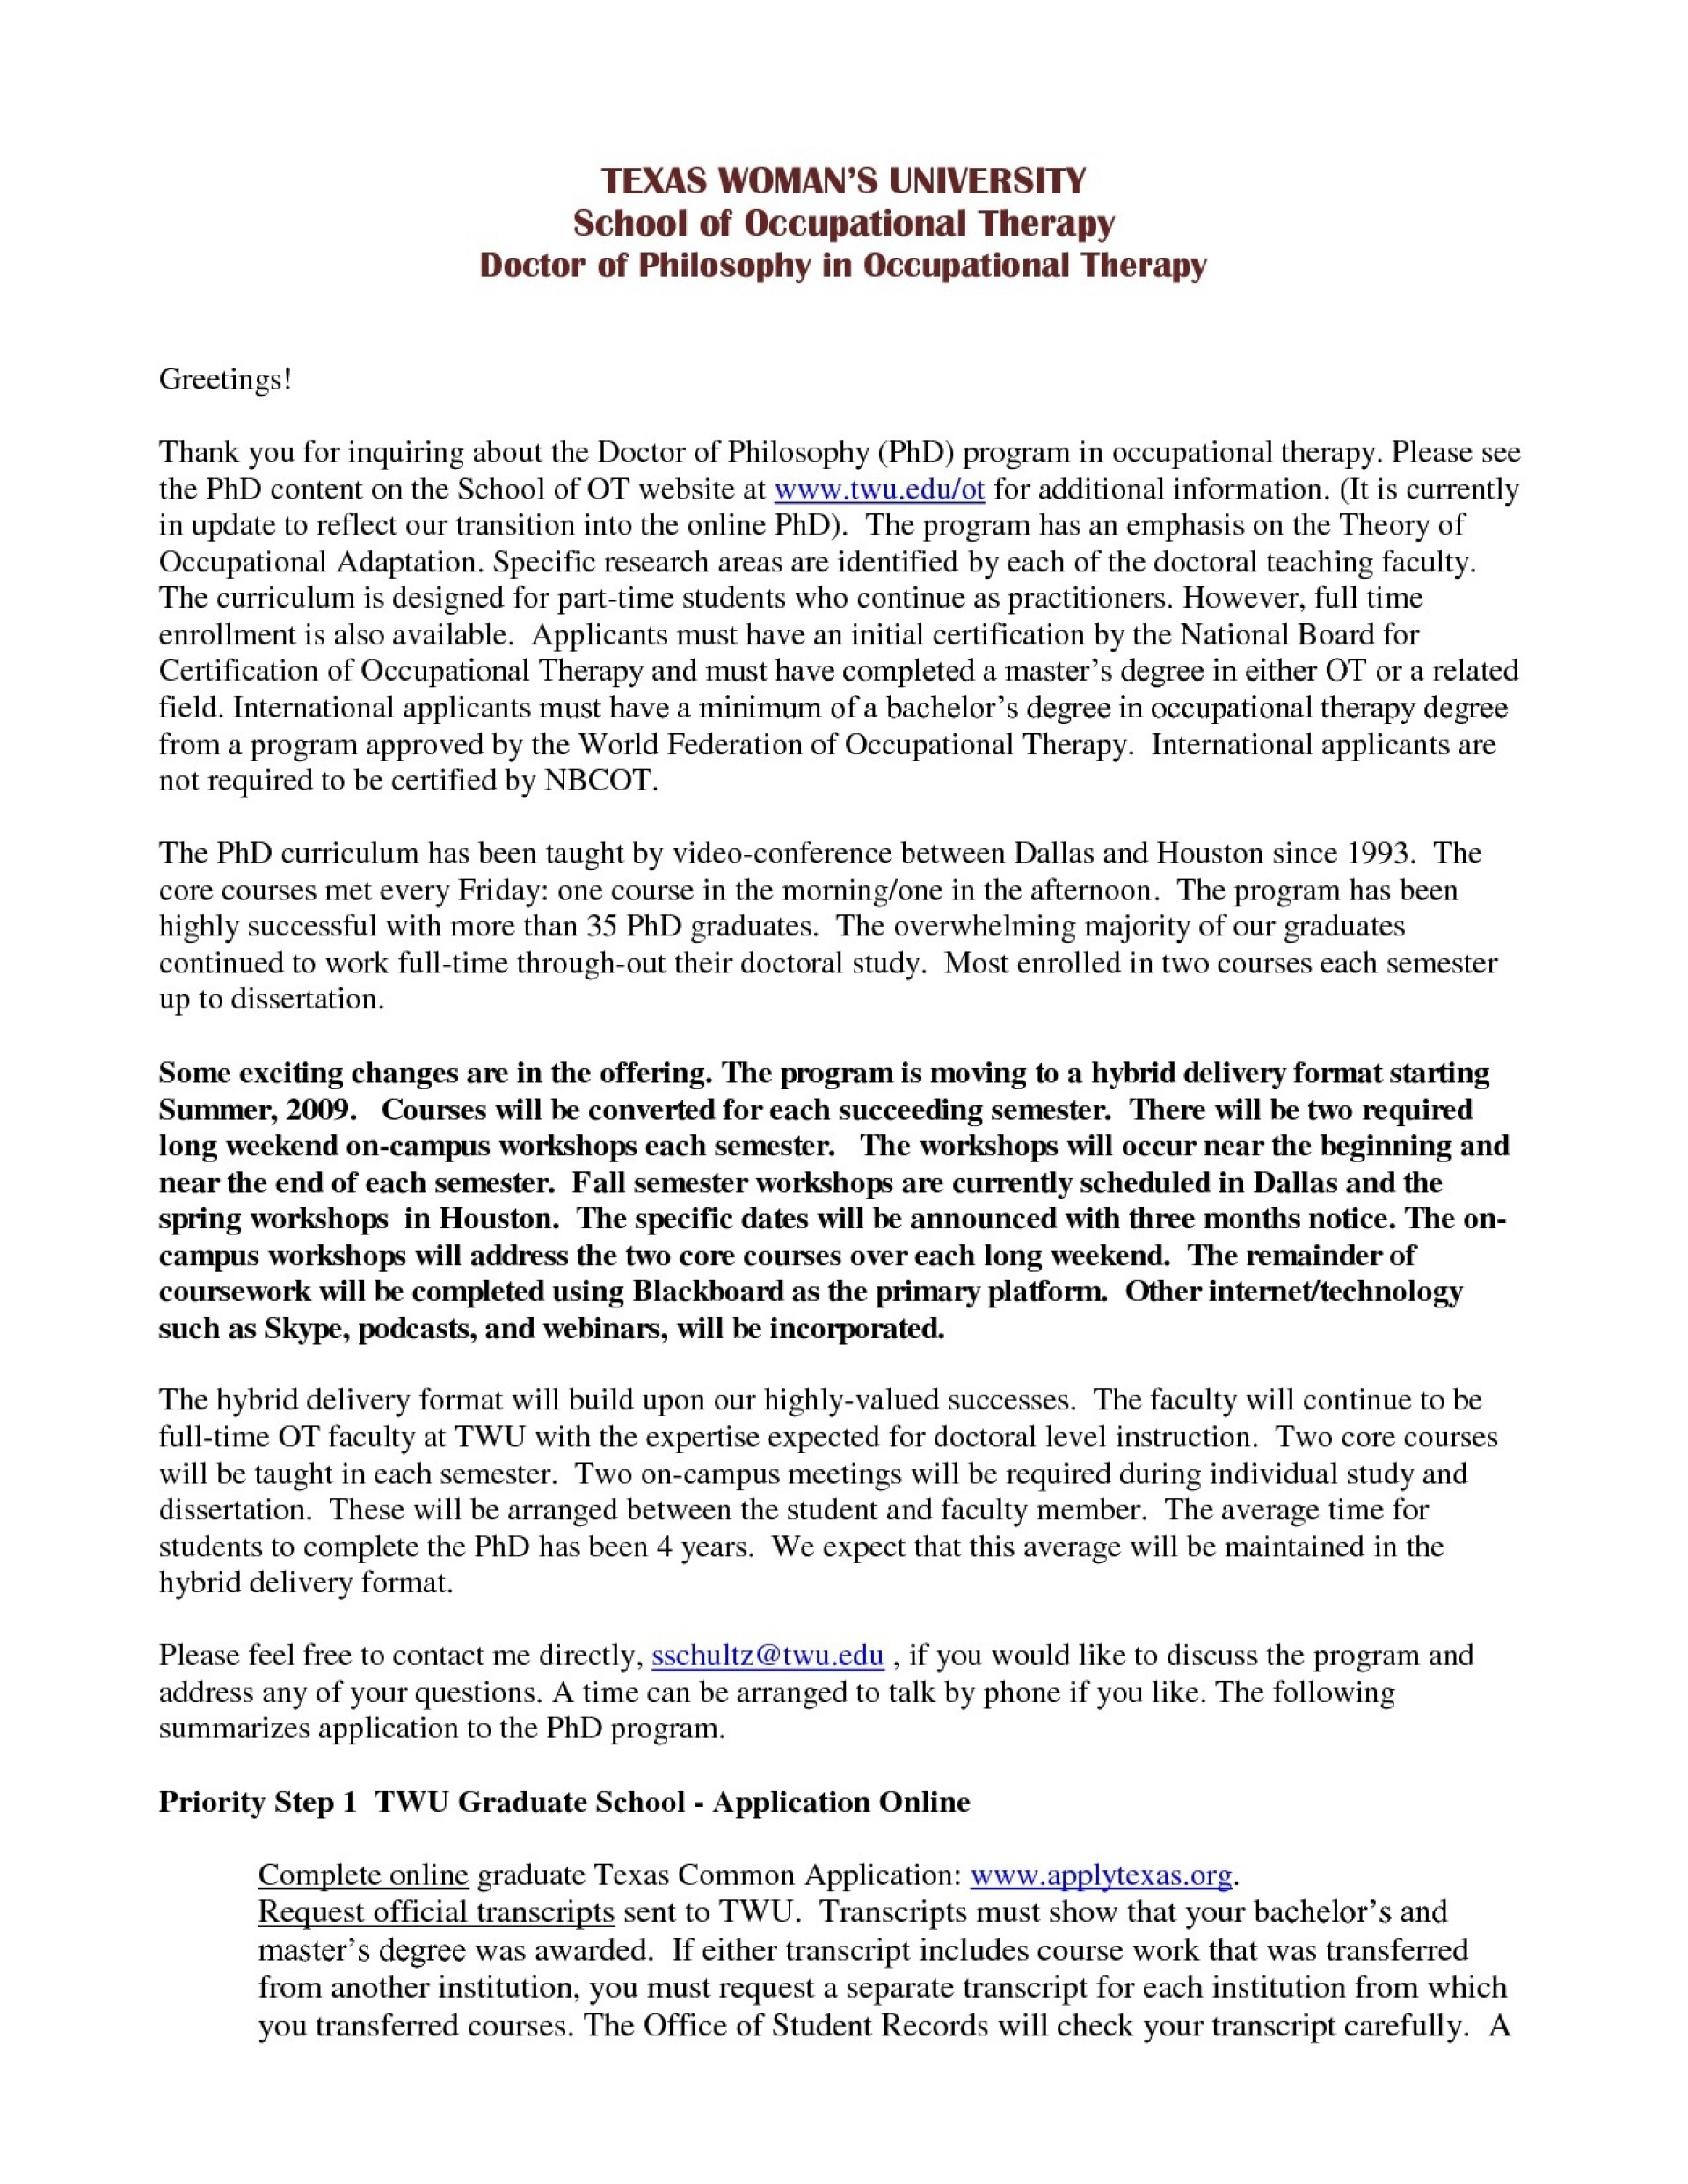 013 Apply Texas Essay Questions Poemsrom Co Common Ap Joli Vibramusic For College Prompts Exa Topics Unusual Examples Topic A 2016 C 1920